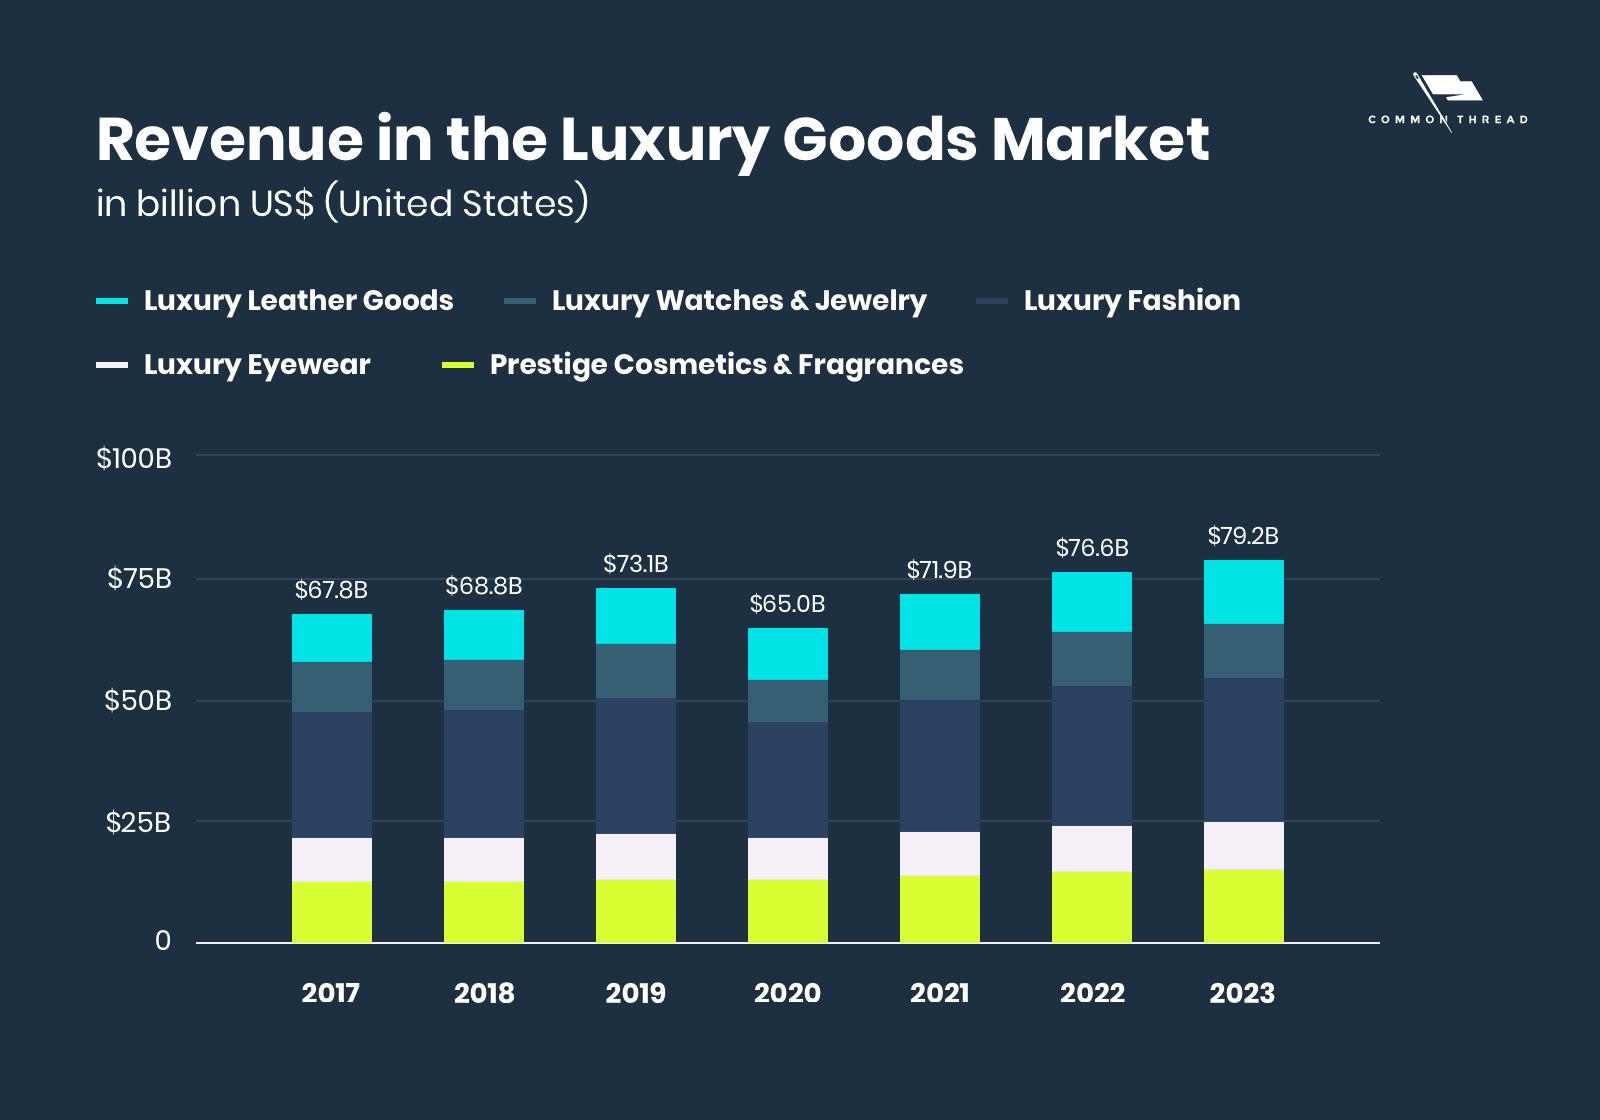 Revenue in the luxury goods market